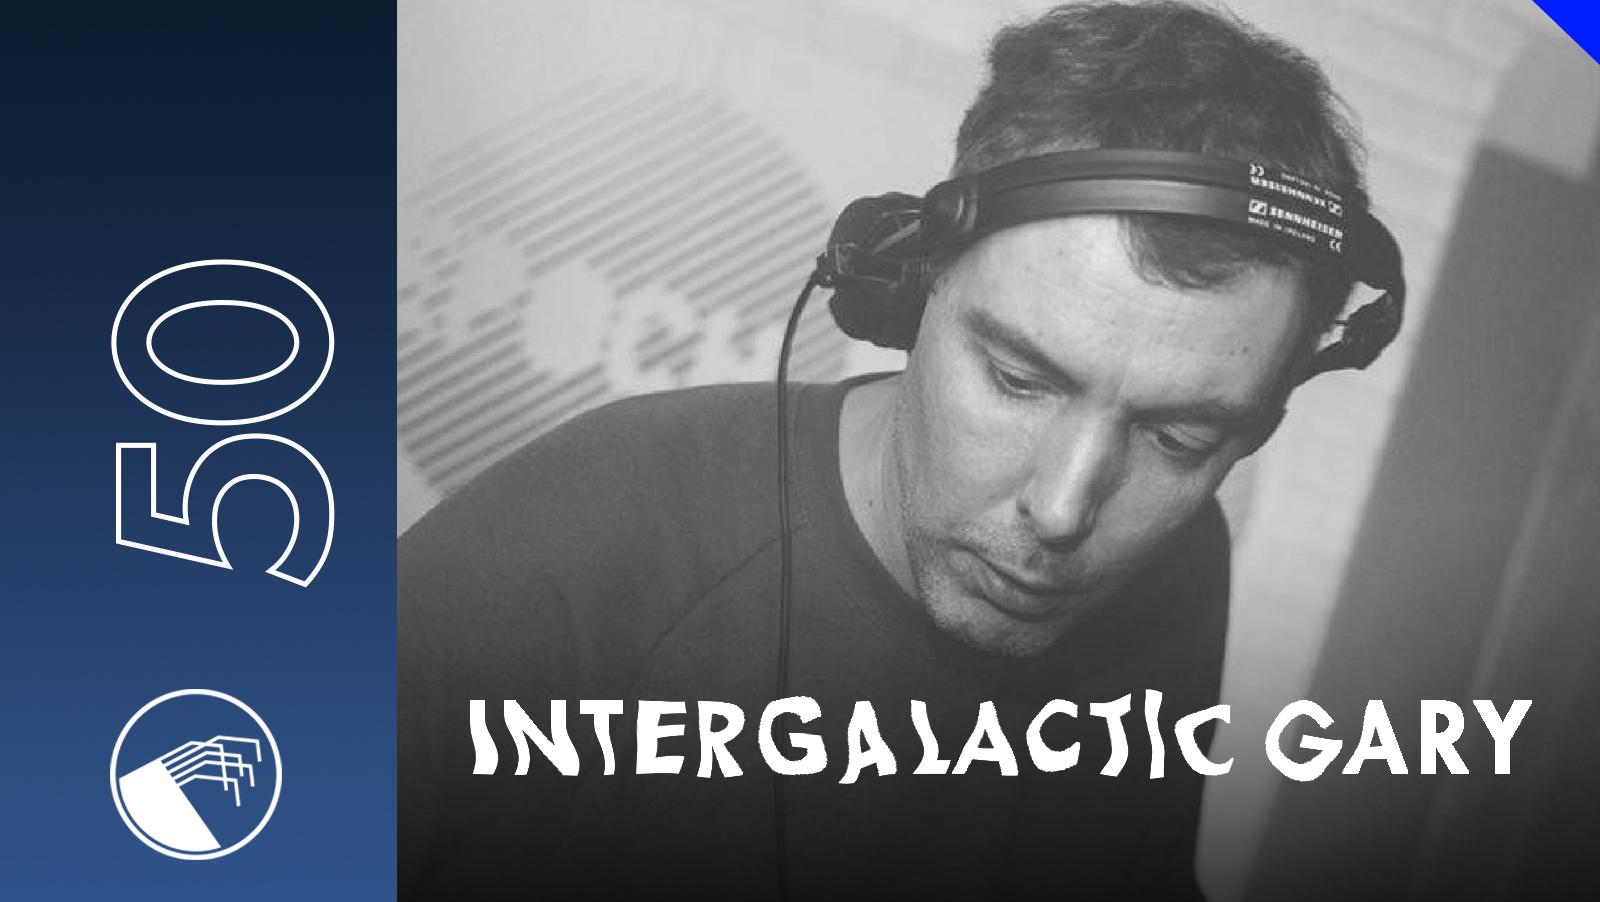 050 Intergalactic Gary